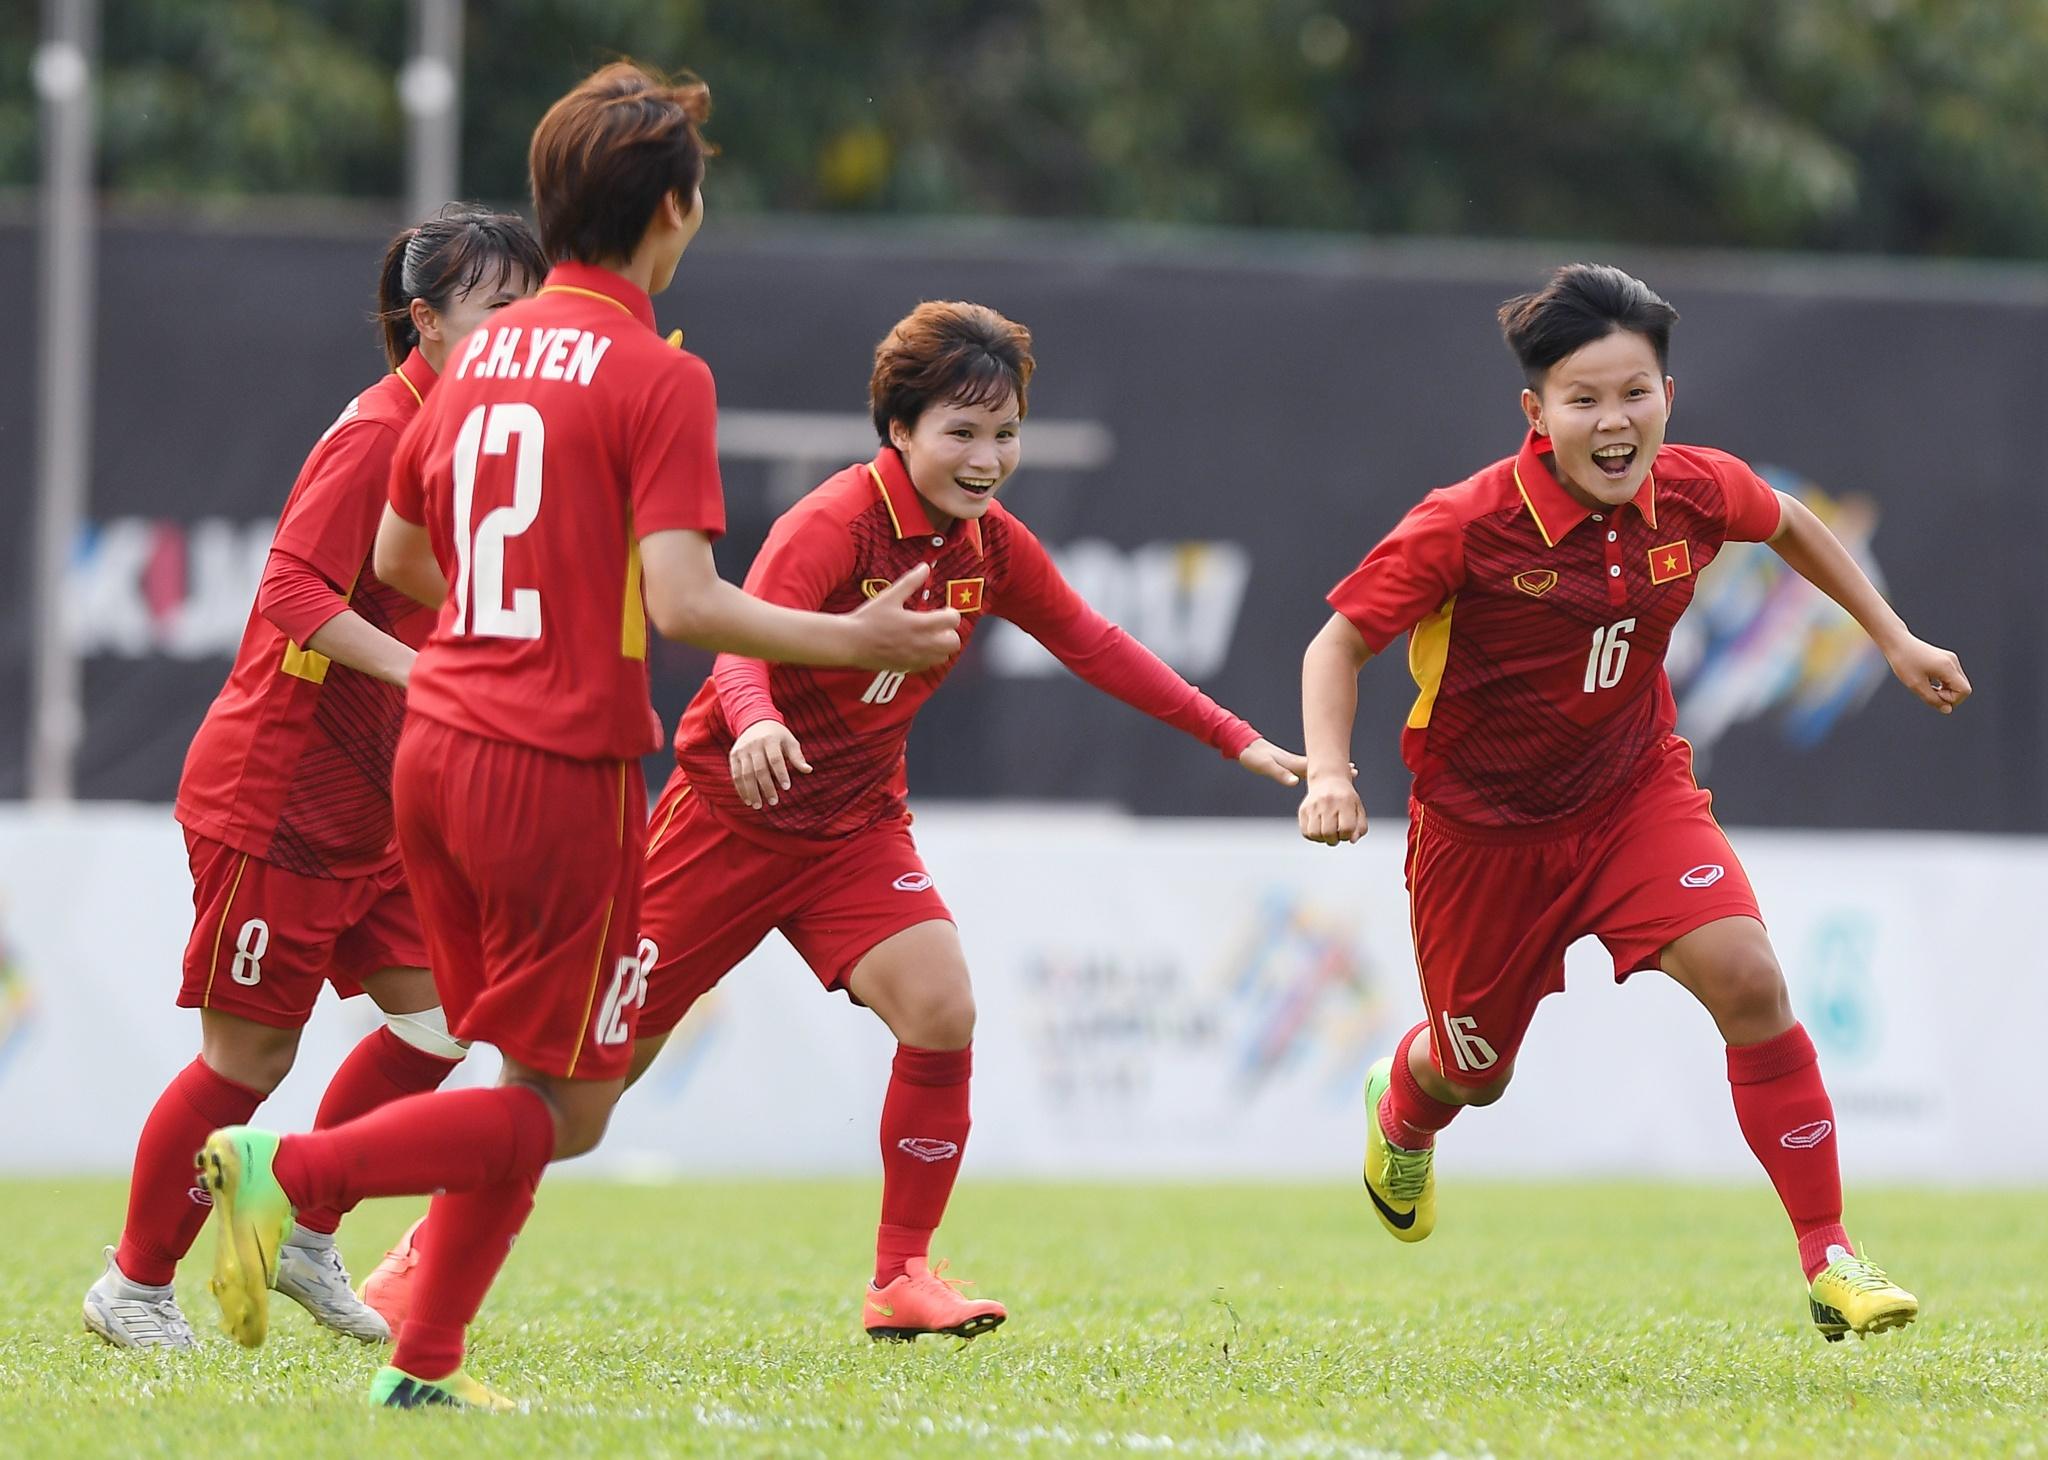 Khoanh khac dep cua nhung co gai vang Viet Nam tai SEA Games 2017 hinh anh 14